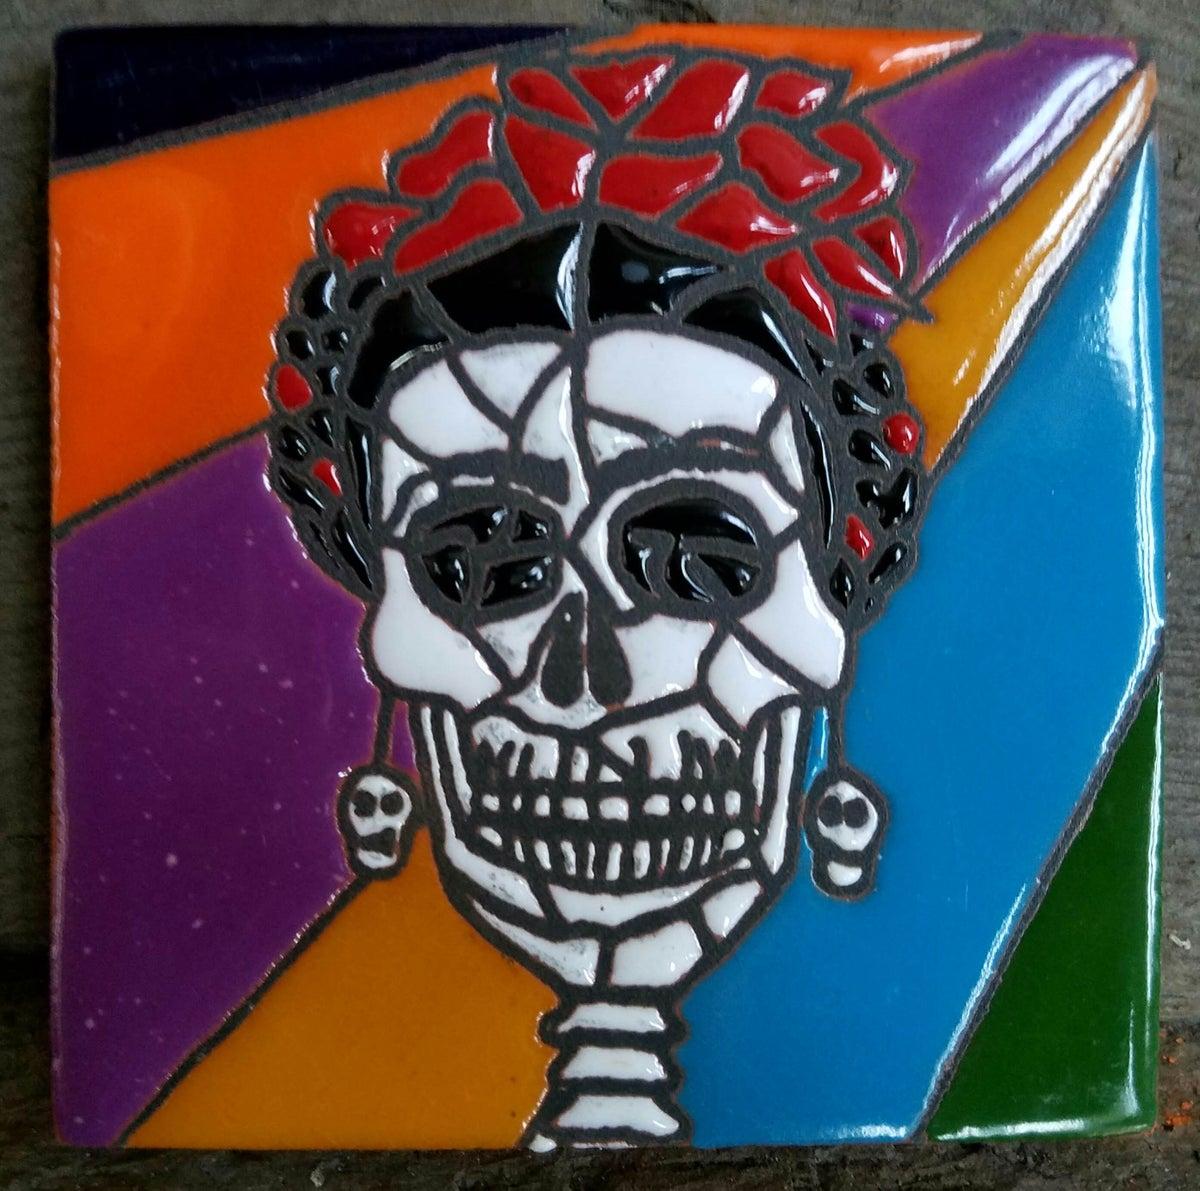 Image of frida muerto mozaic